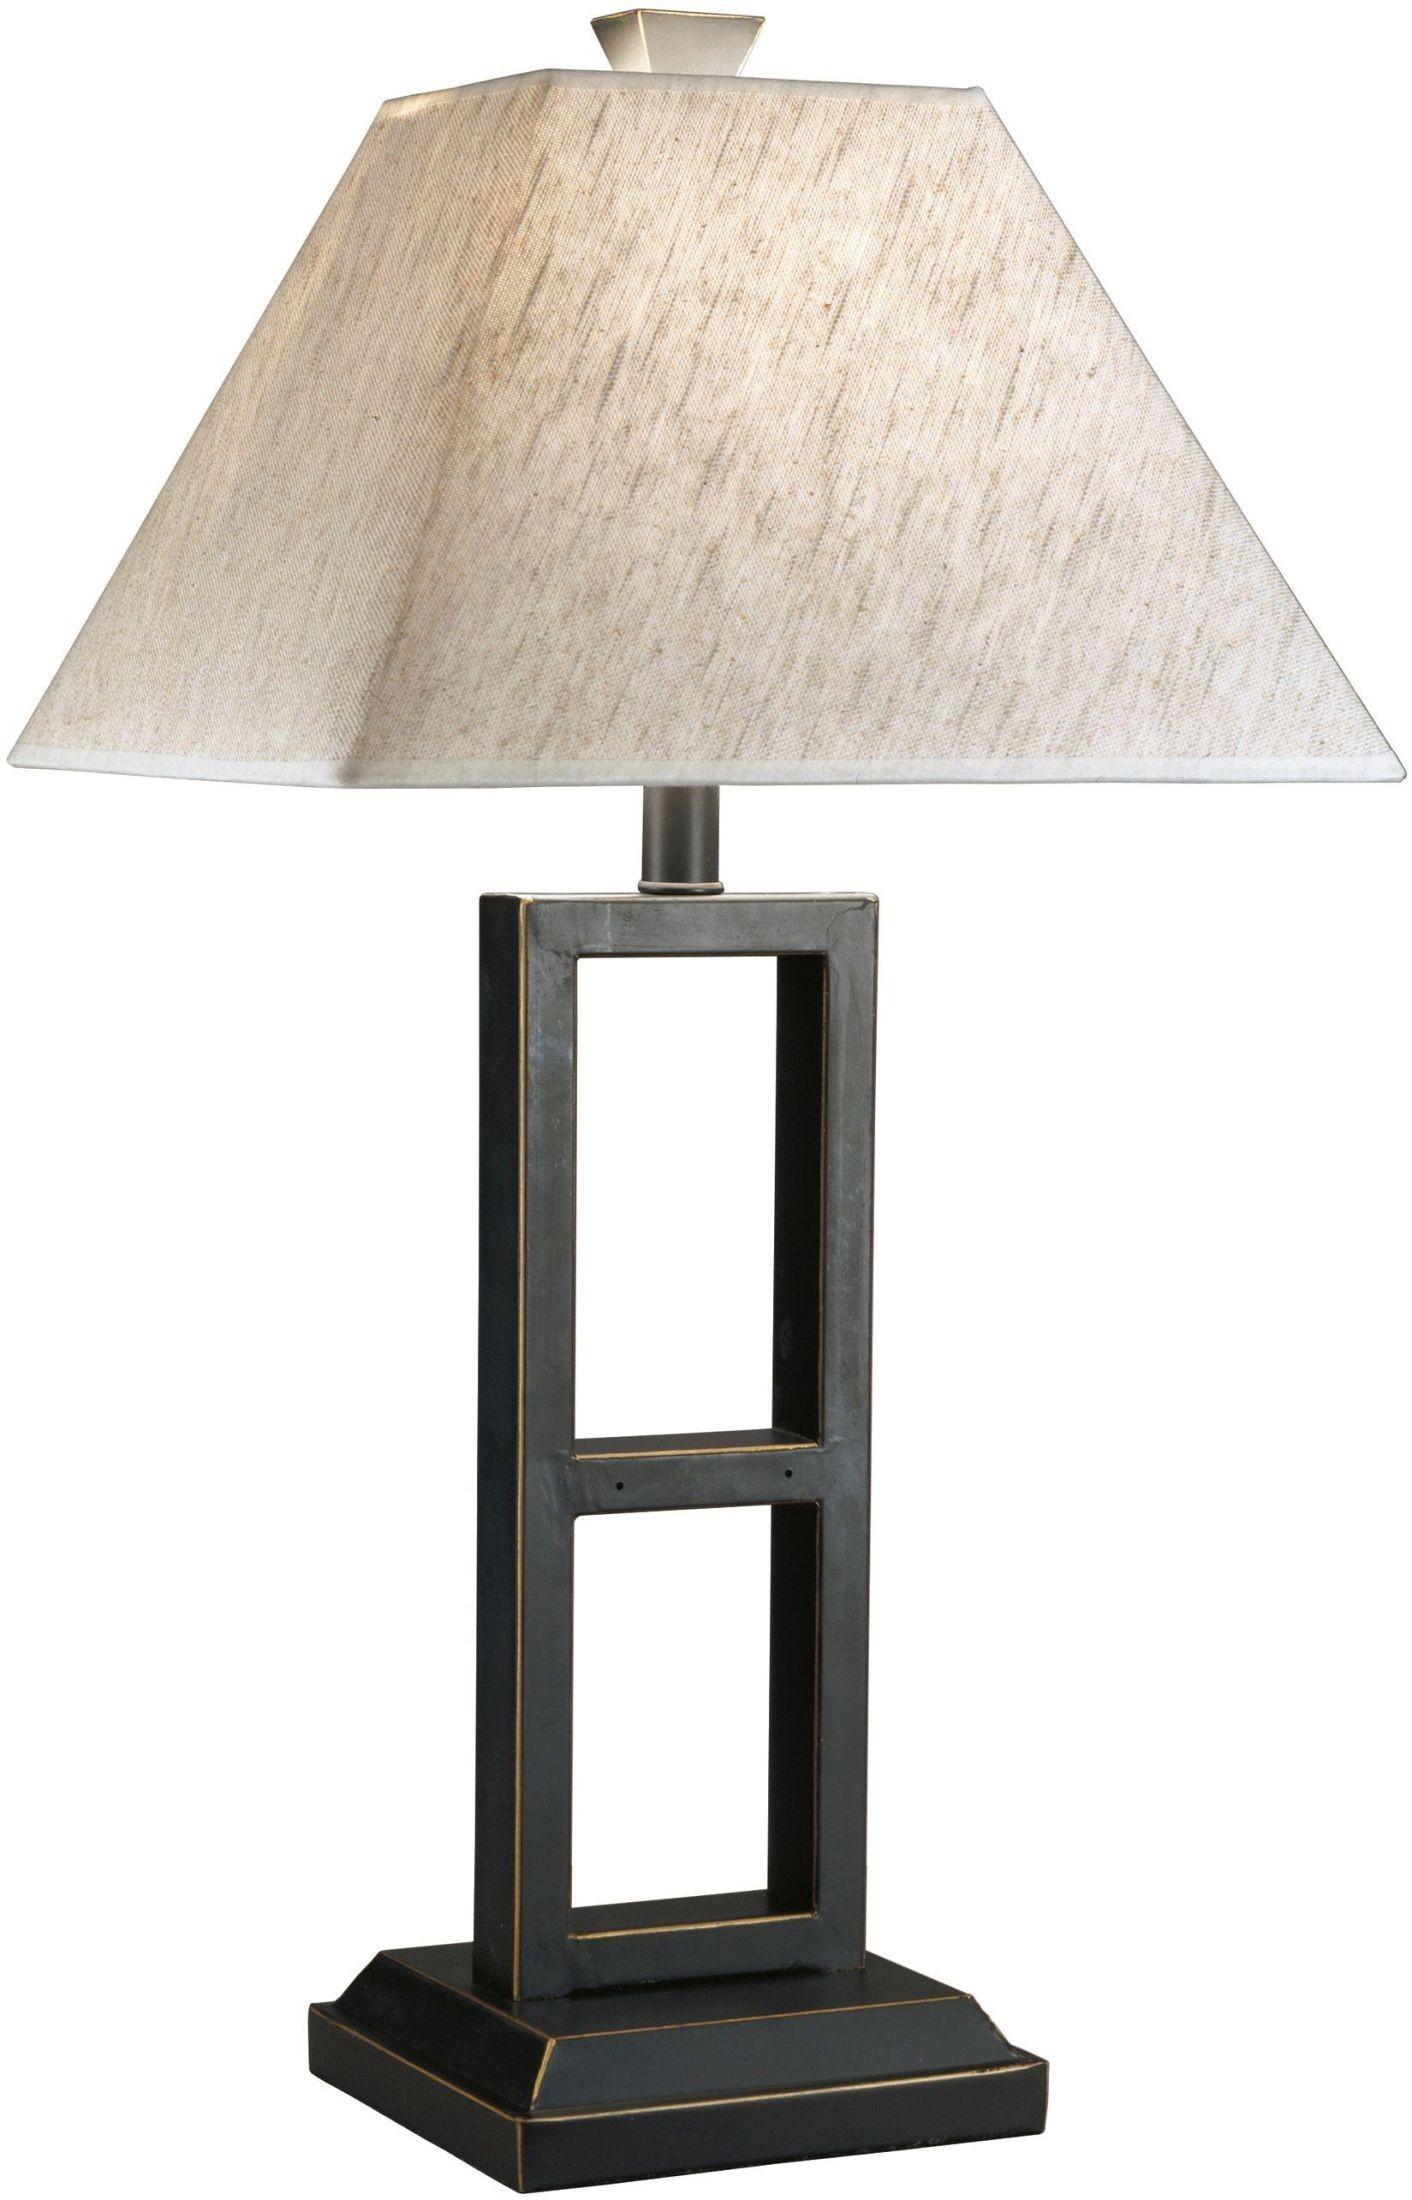 Deidra Table L&s Set of 2  sc 1 st  Coleman Furniture & Deidra Table Lamps Set of 2 from Ashley (L318924) | Coleman Furniture